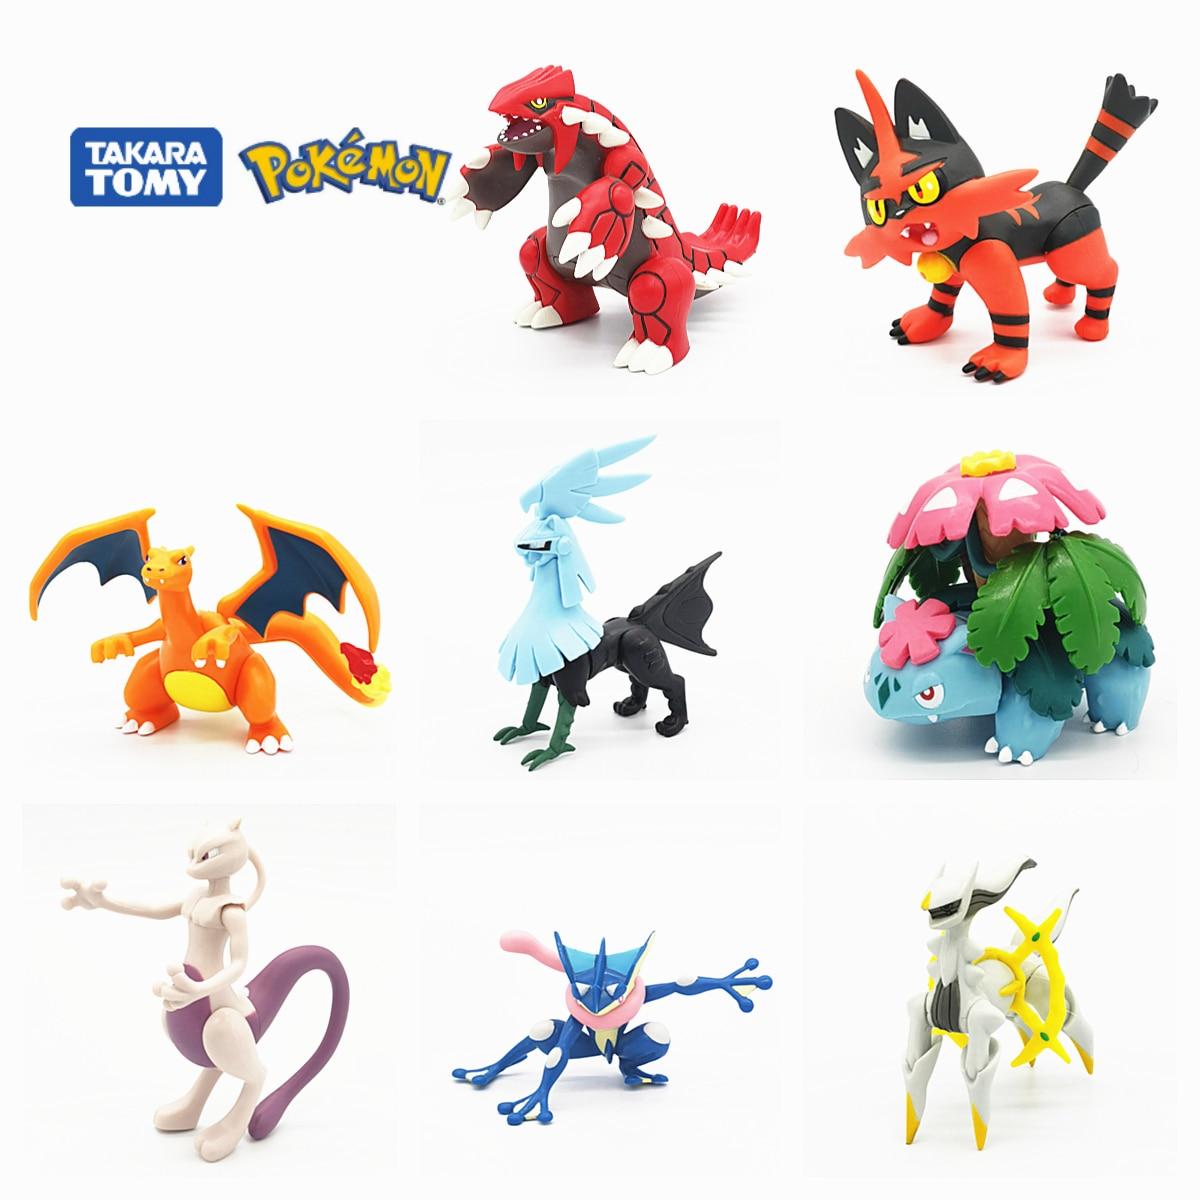 Tomy pokemon anime deus besta grande robô móvel figura brinquedo 6-13 cm charizard greninja solgaleo arceus groudon decoração presente